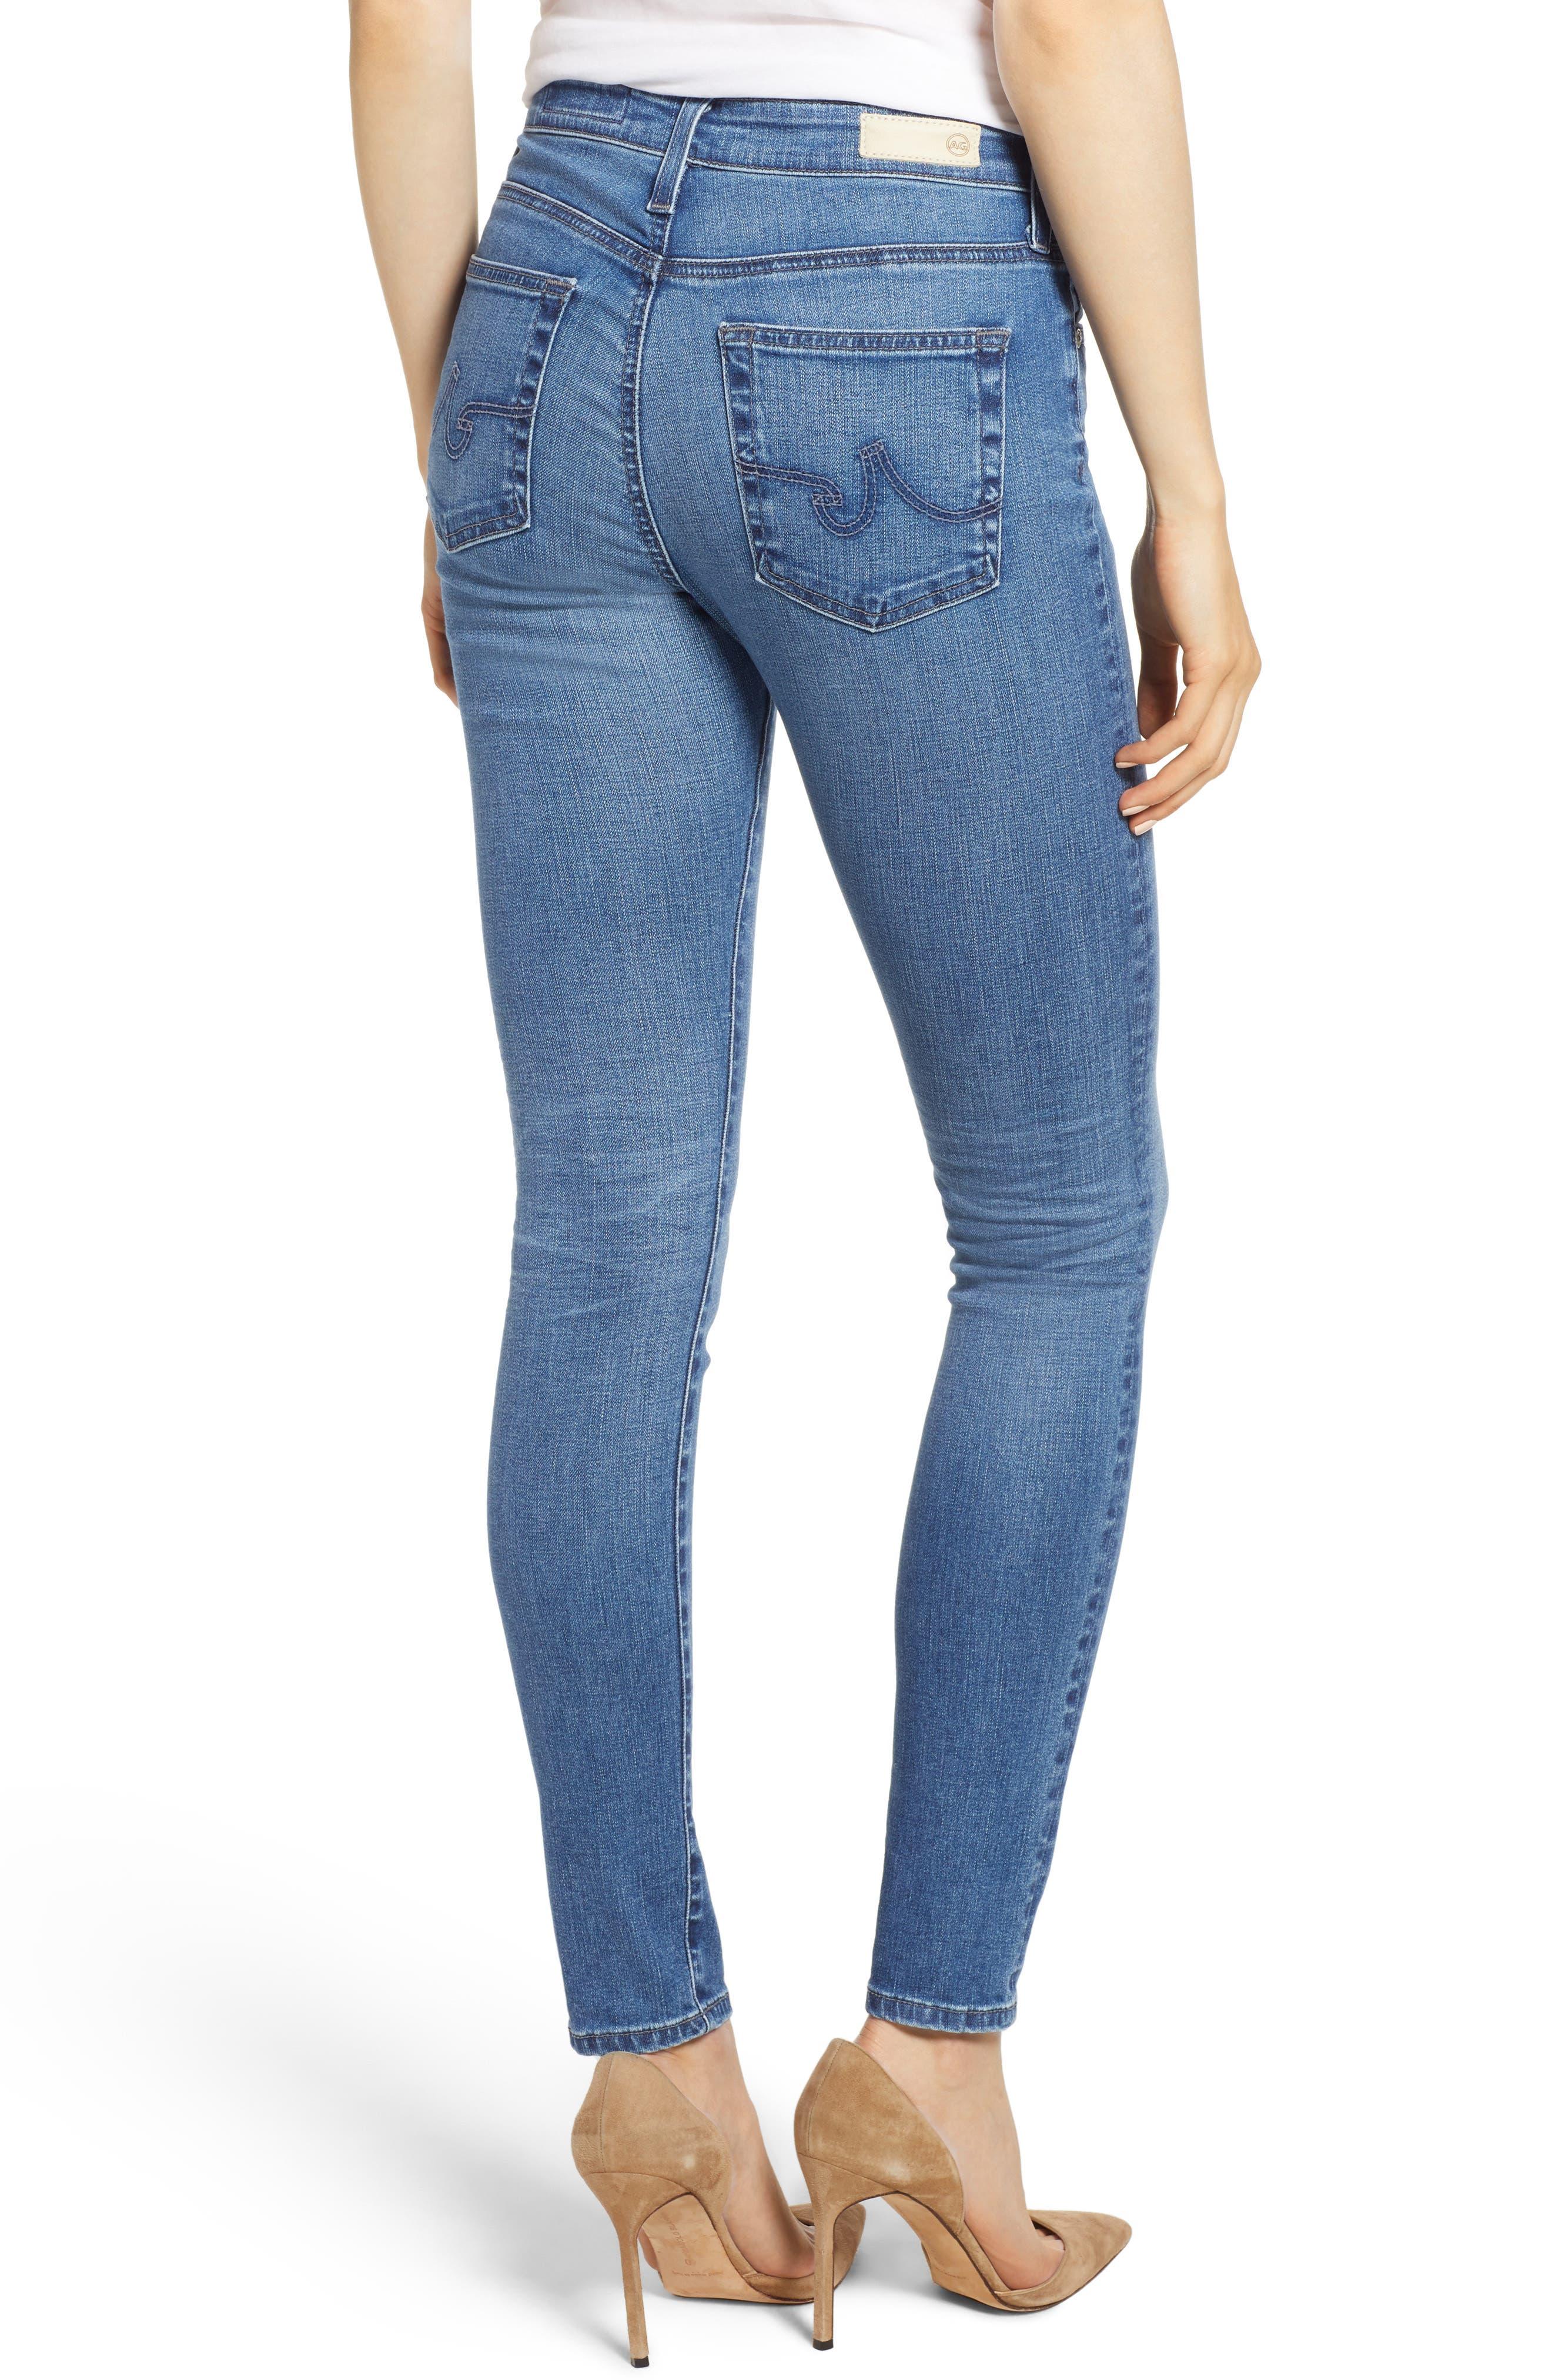 'The Farrah' High Rise Skinny Jeans,                             Alternate thumbnail 17, color,